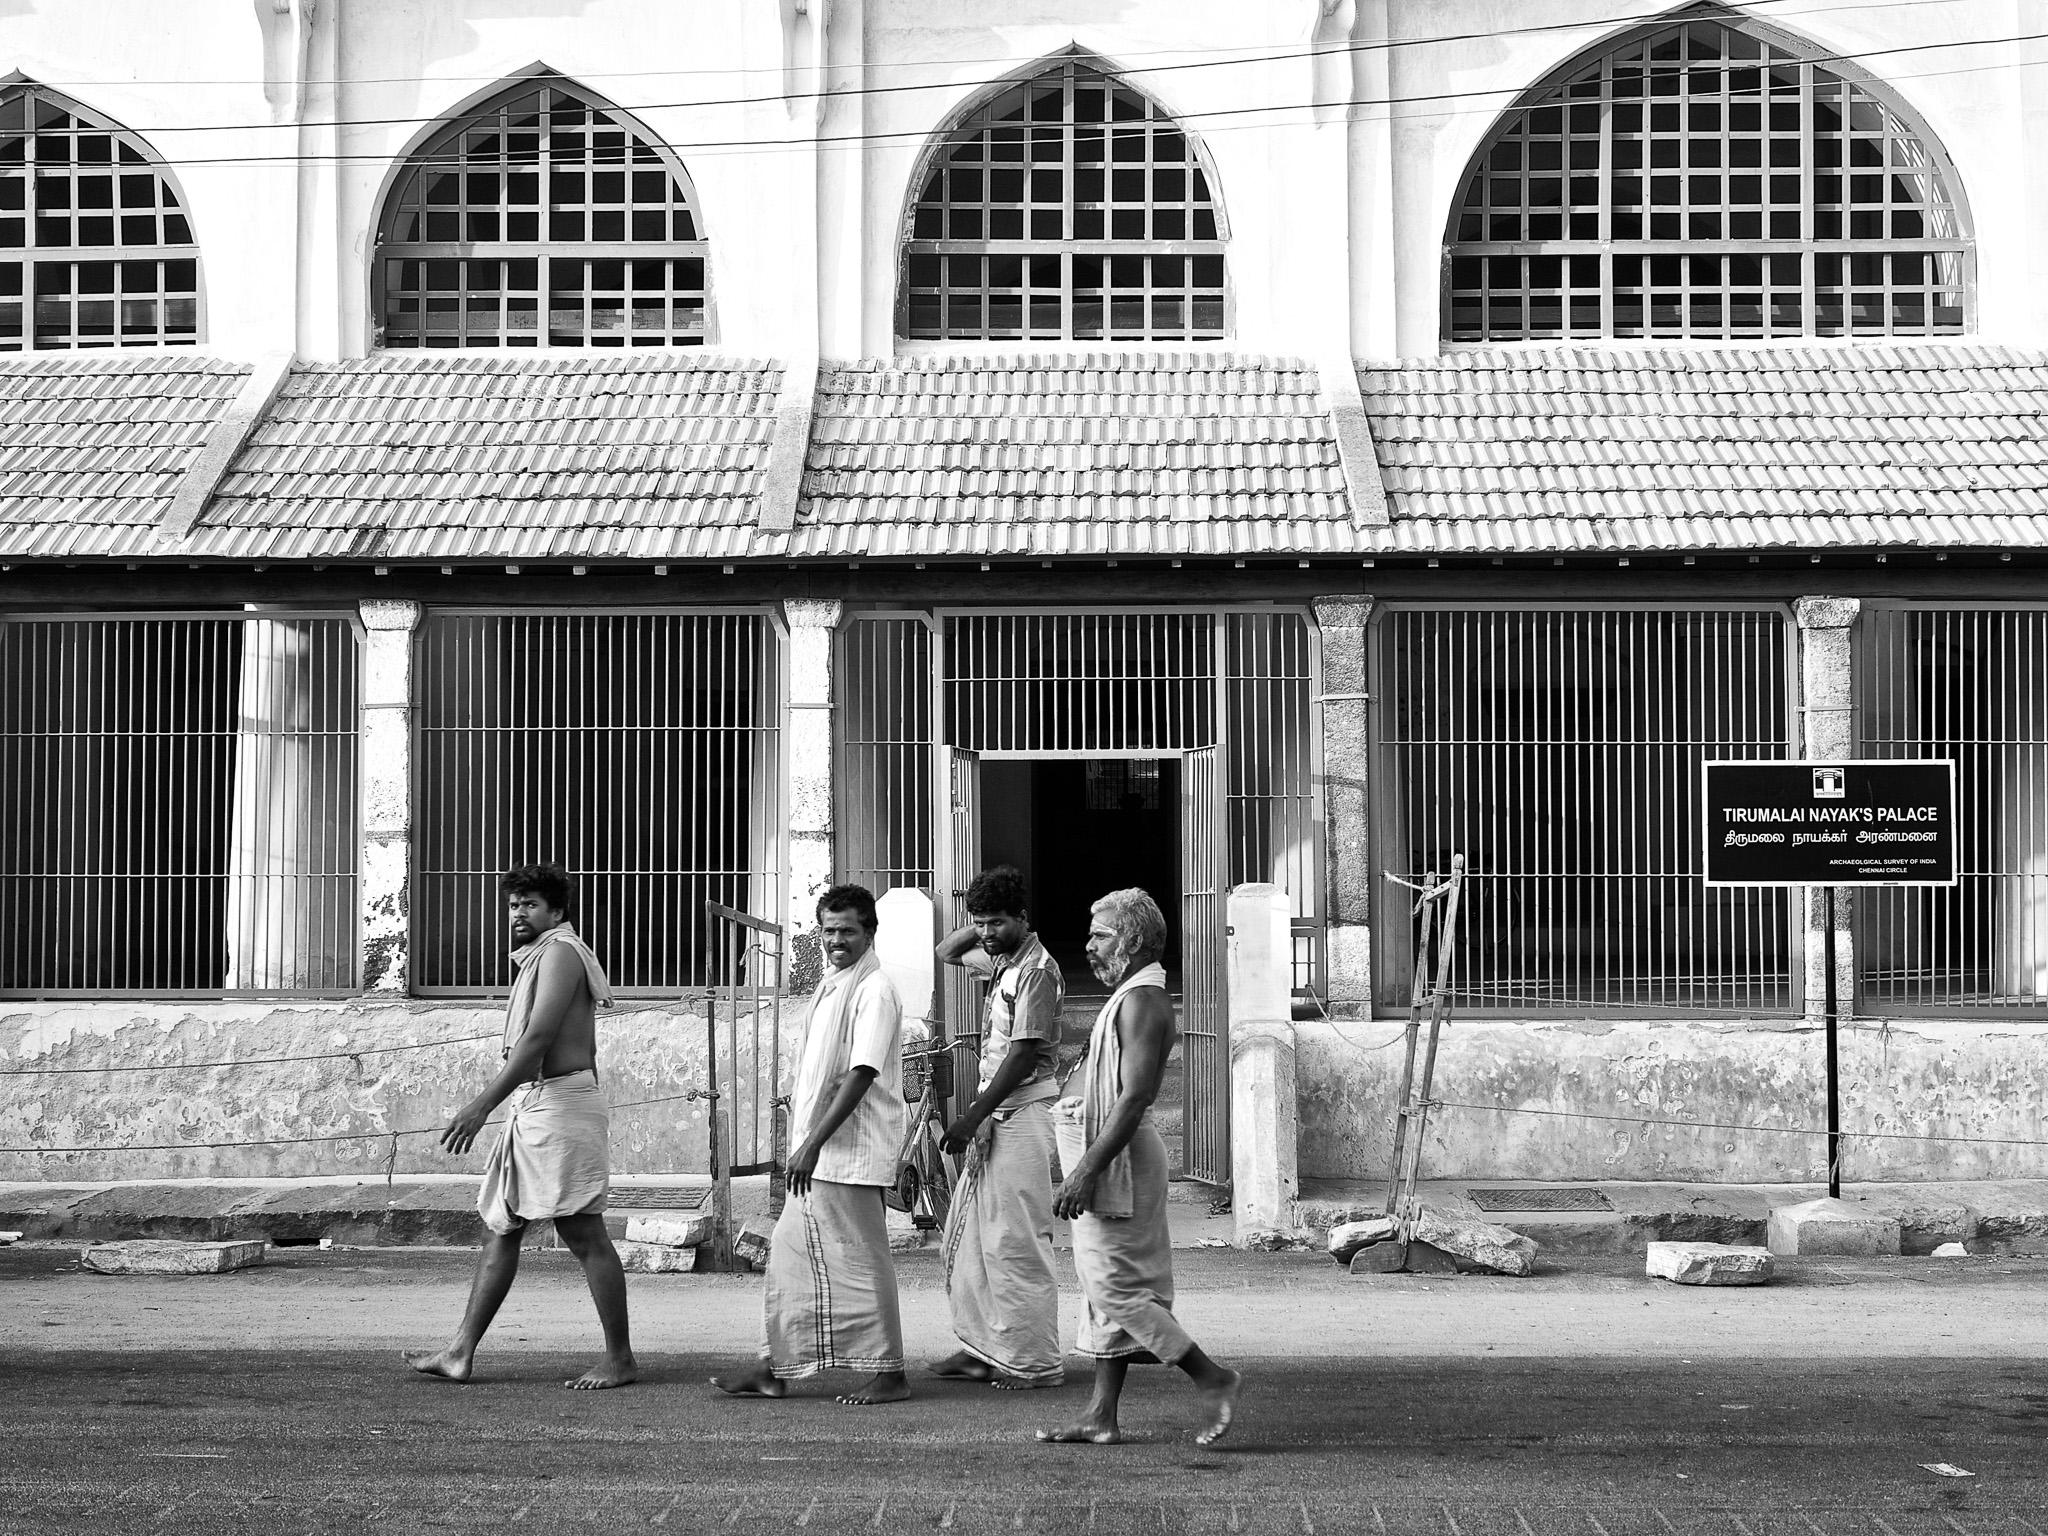 A group of pilgrims walking past a smaller old palace building, Tirumalai Nayak's Palace, at Srivilliputhur, Tamil Nadu, India